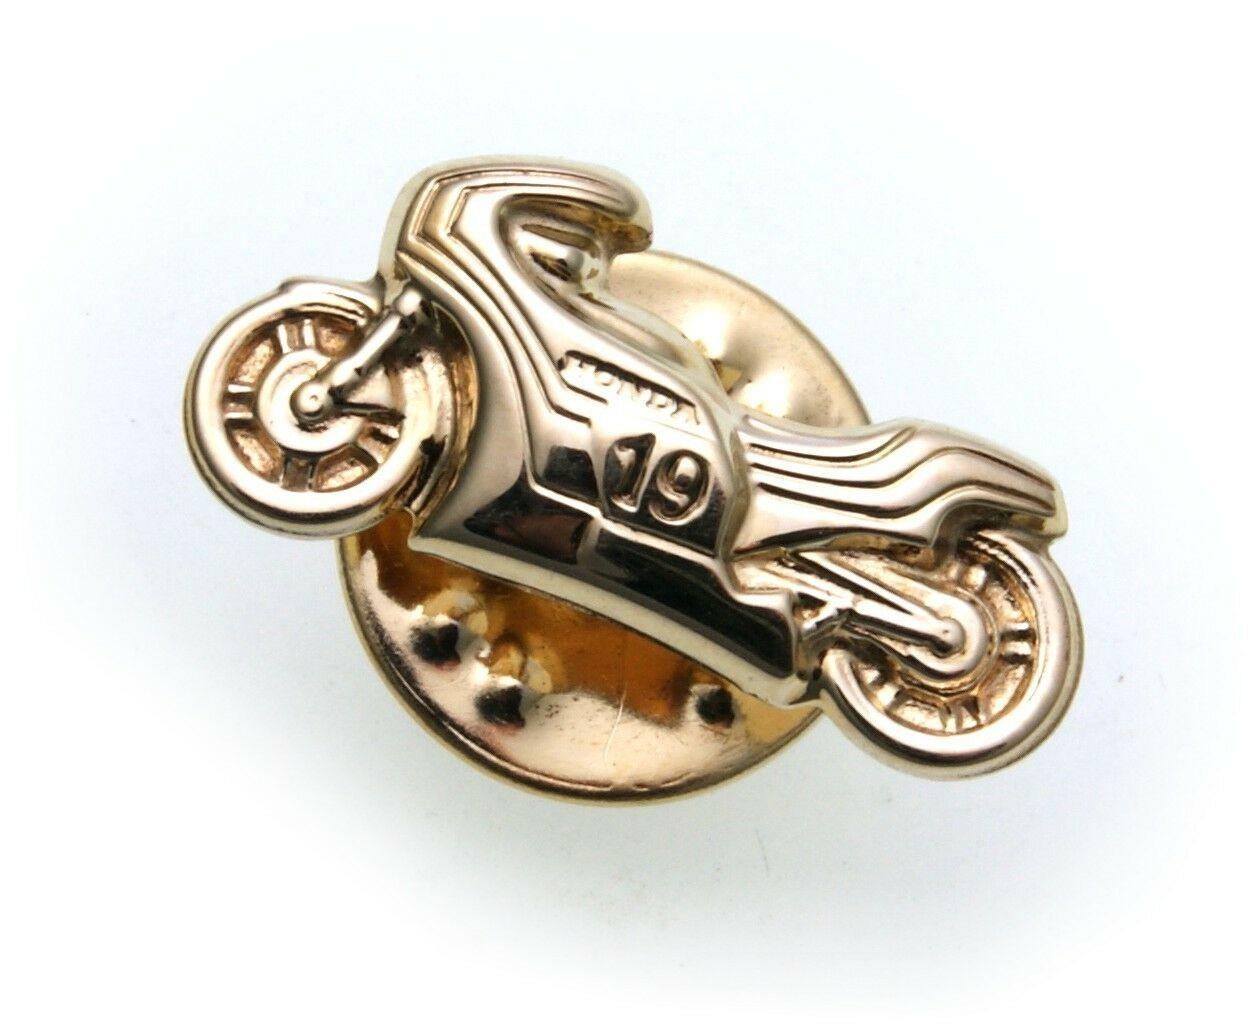 Anstecker Motorrad detailgetreu 333 Gold Stickpin Gelbgold Anstecknadel